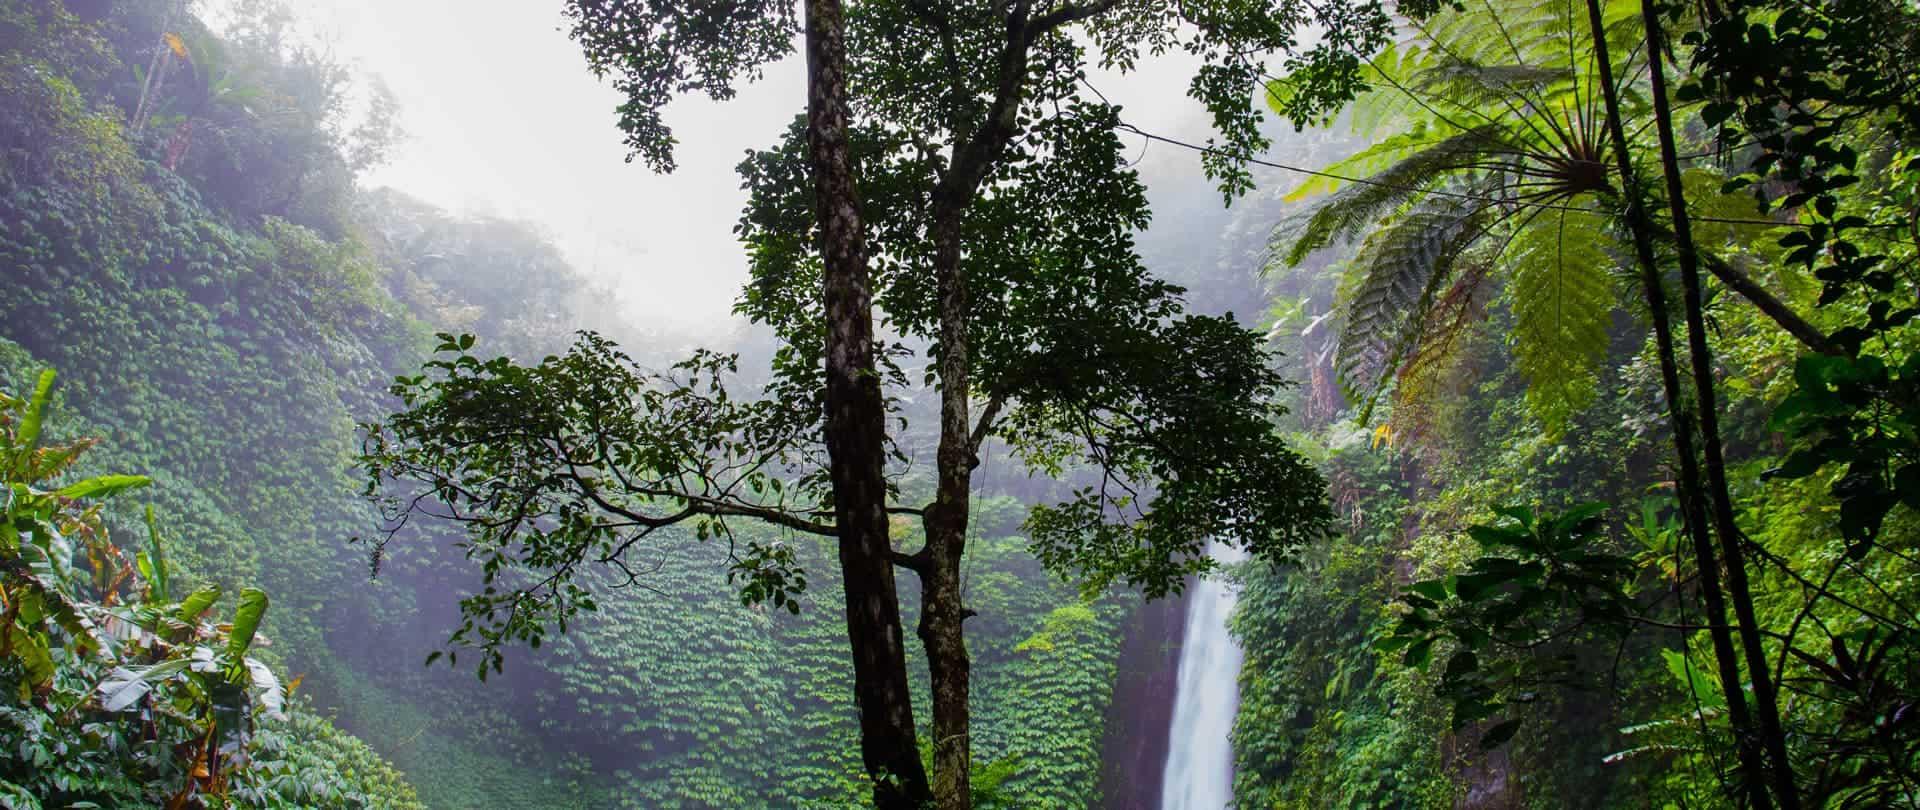 Bananacontent – Das neue Alphatier im SEO Plugin Dschungel